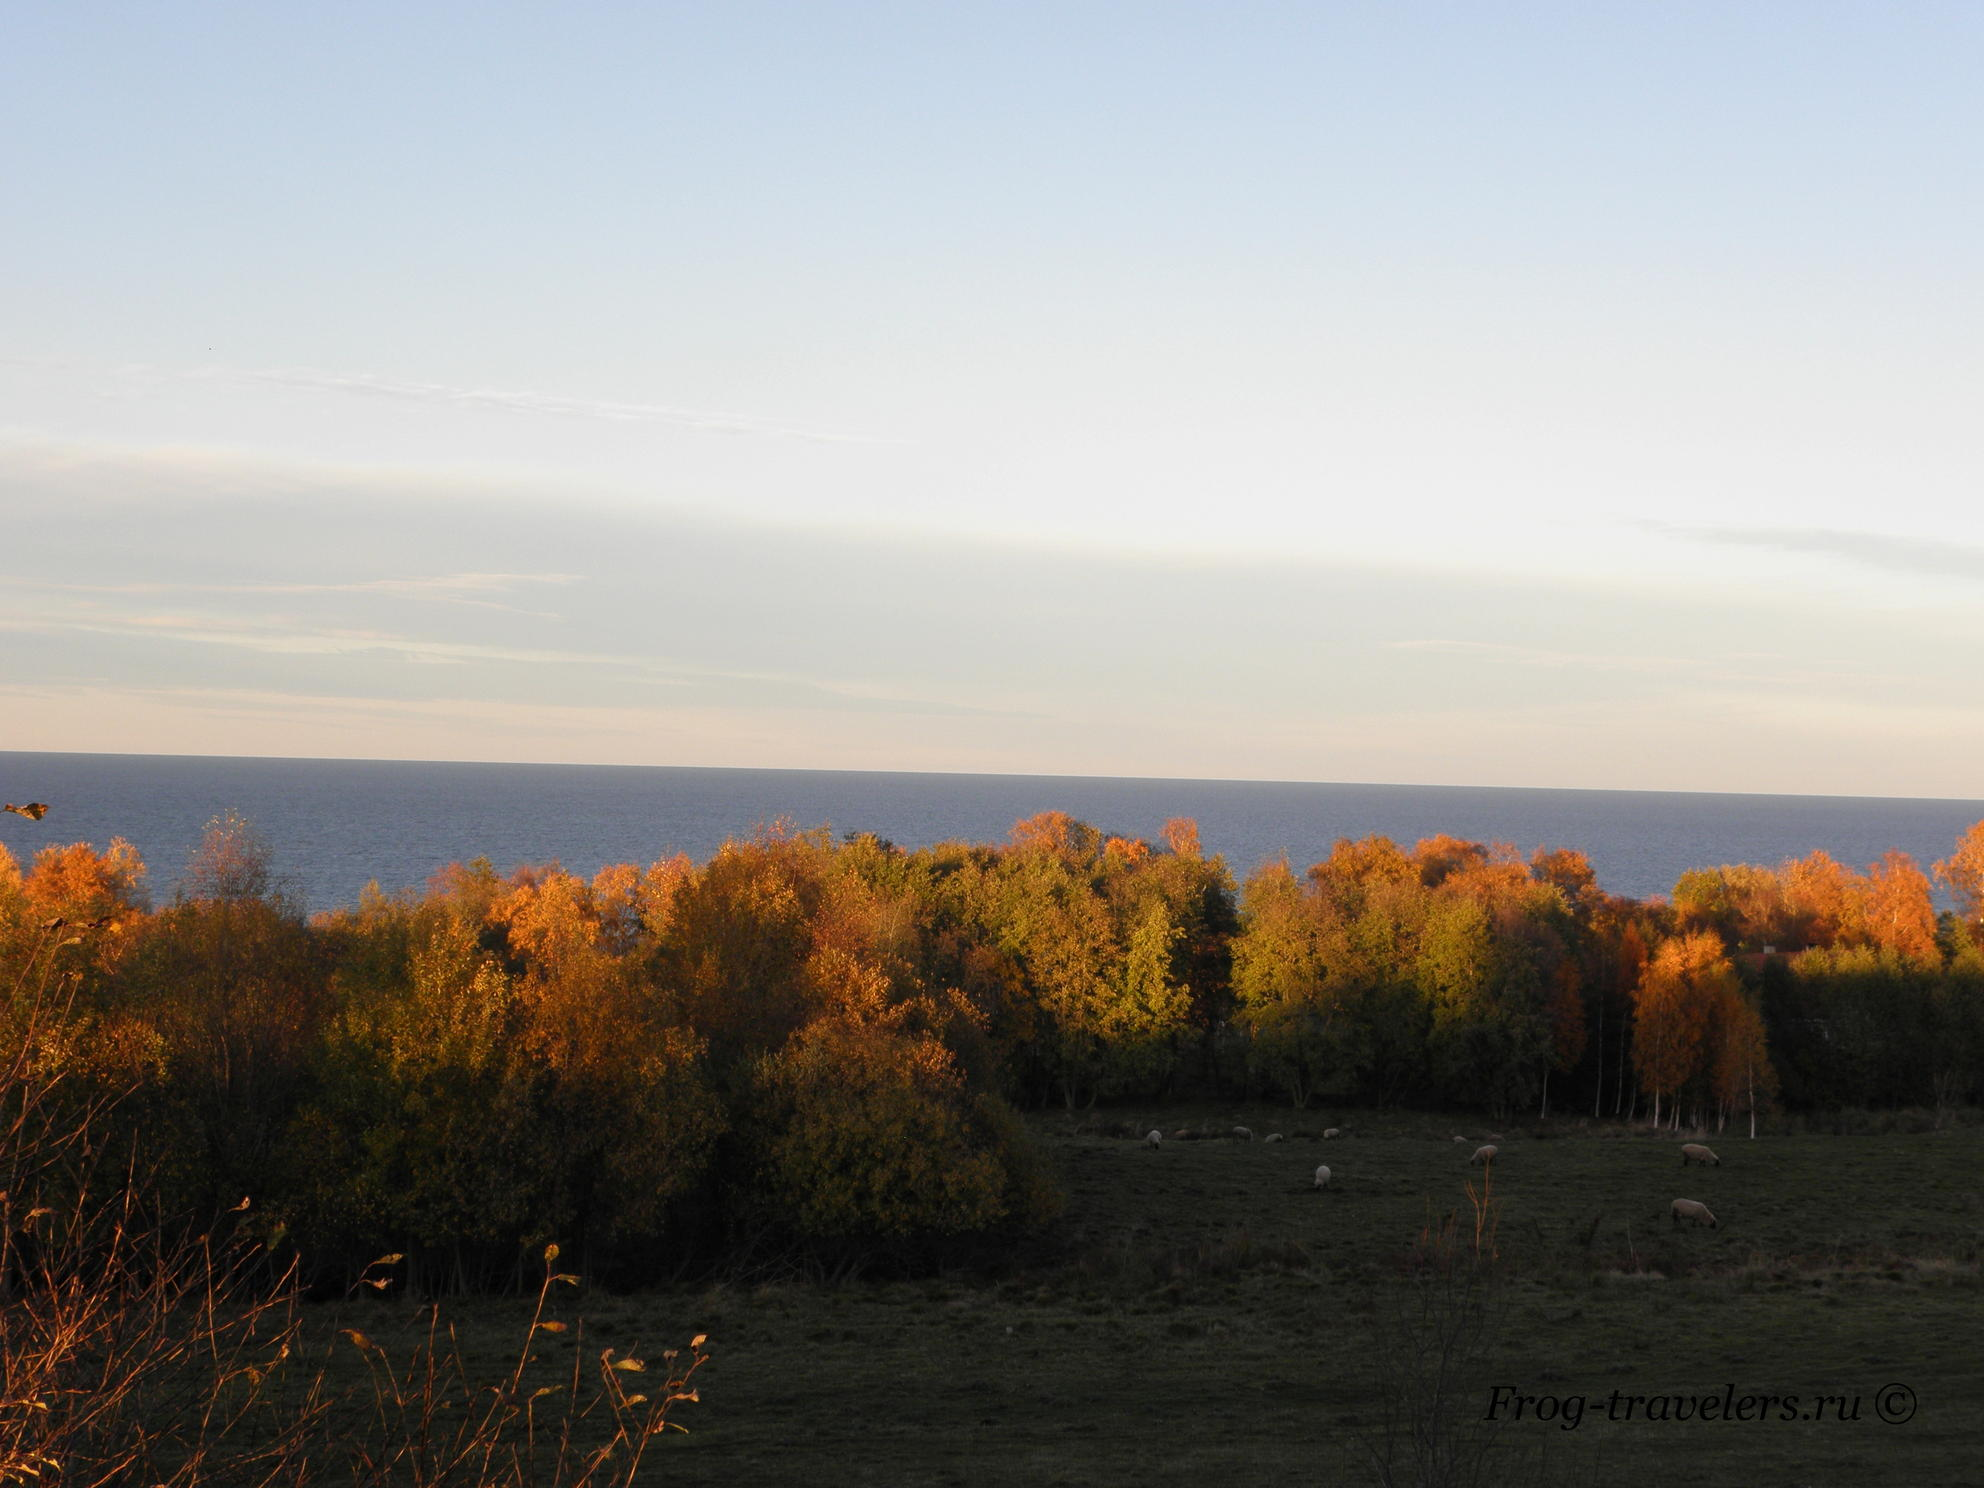 Осенний вечерний вид на Балтийское море и барашки :):